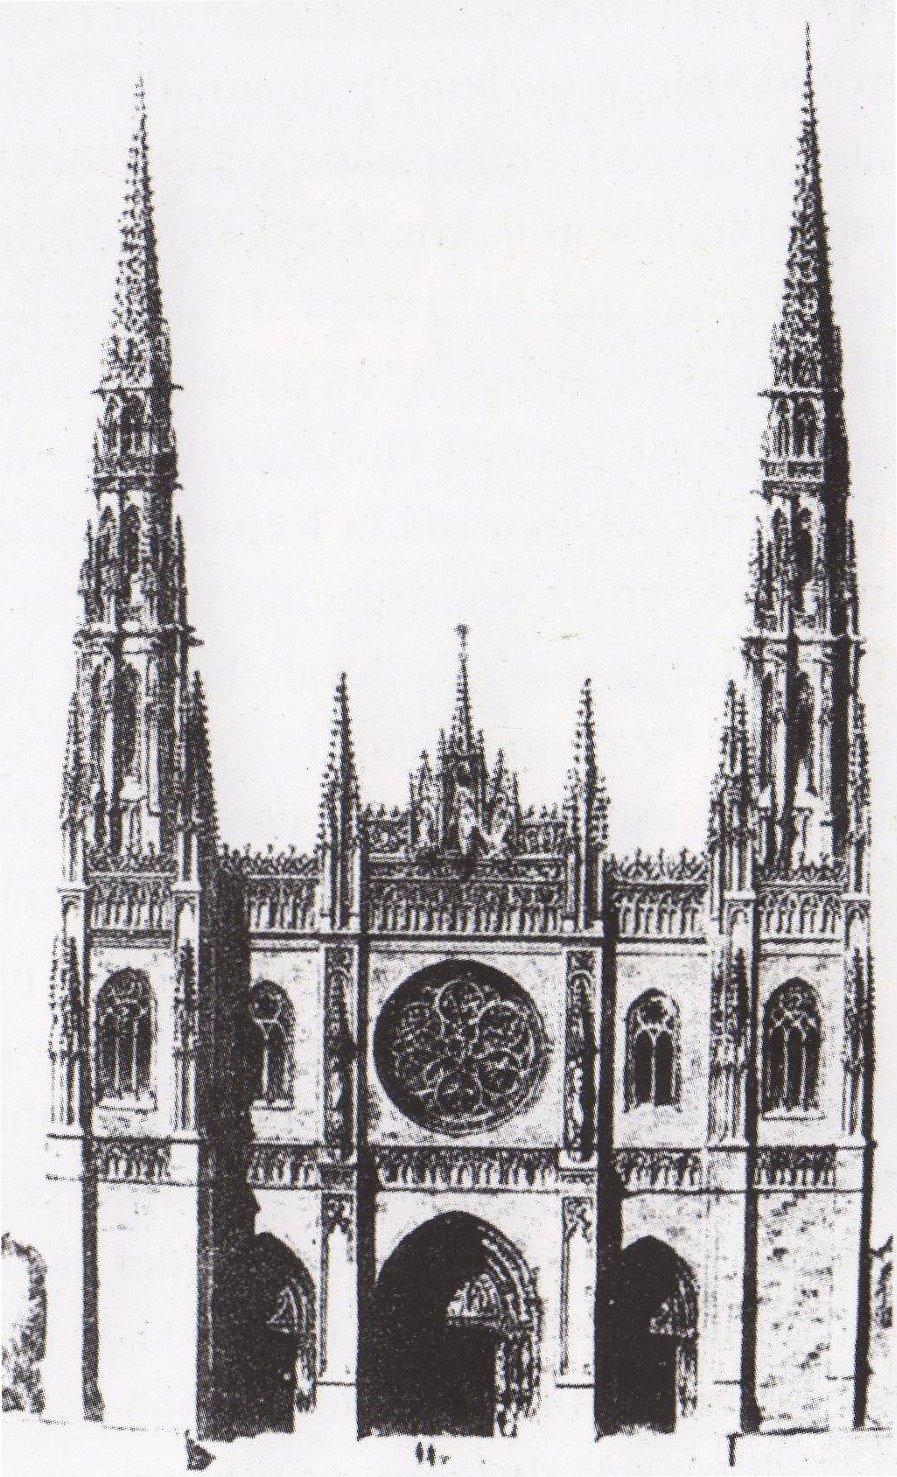 La Milagrosa basílica Sevilla